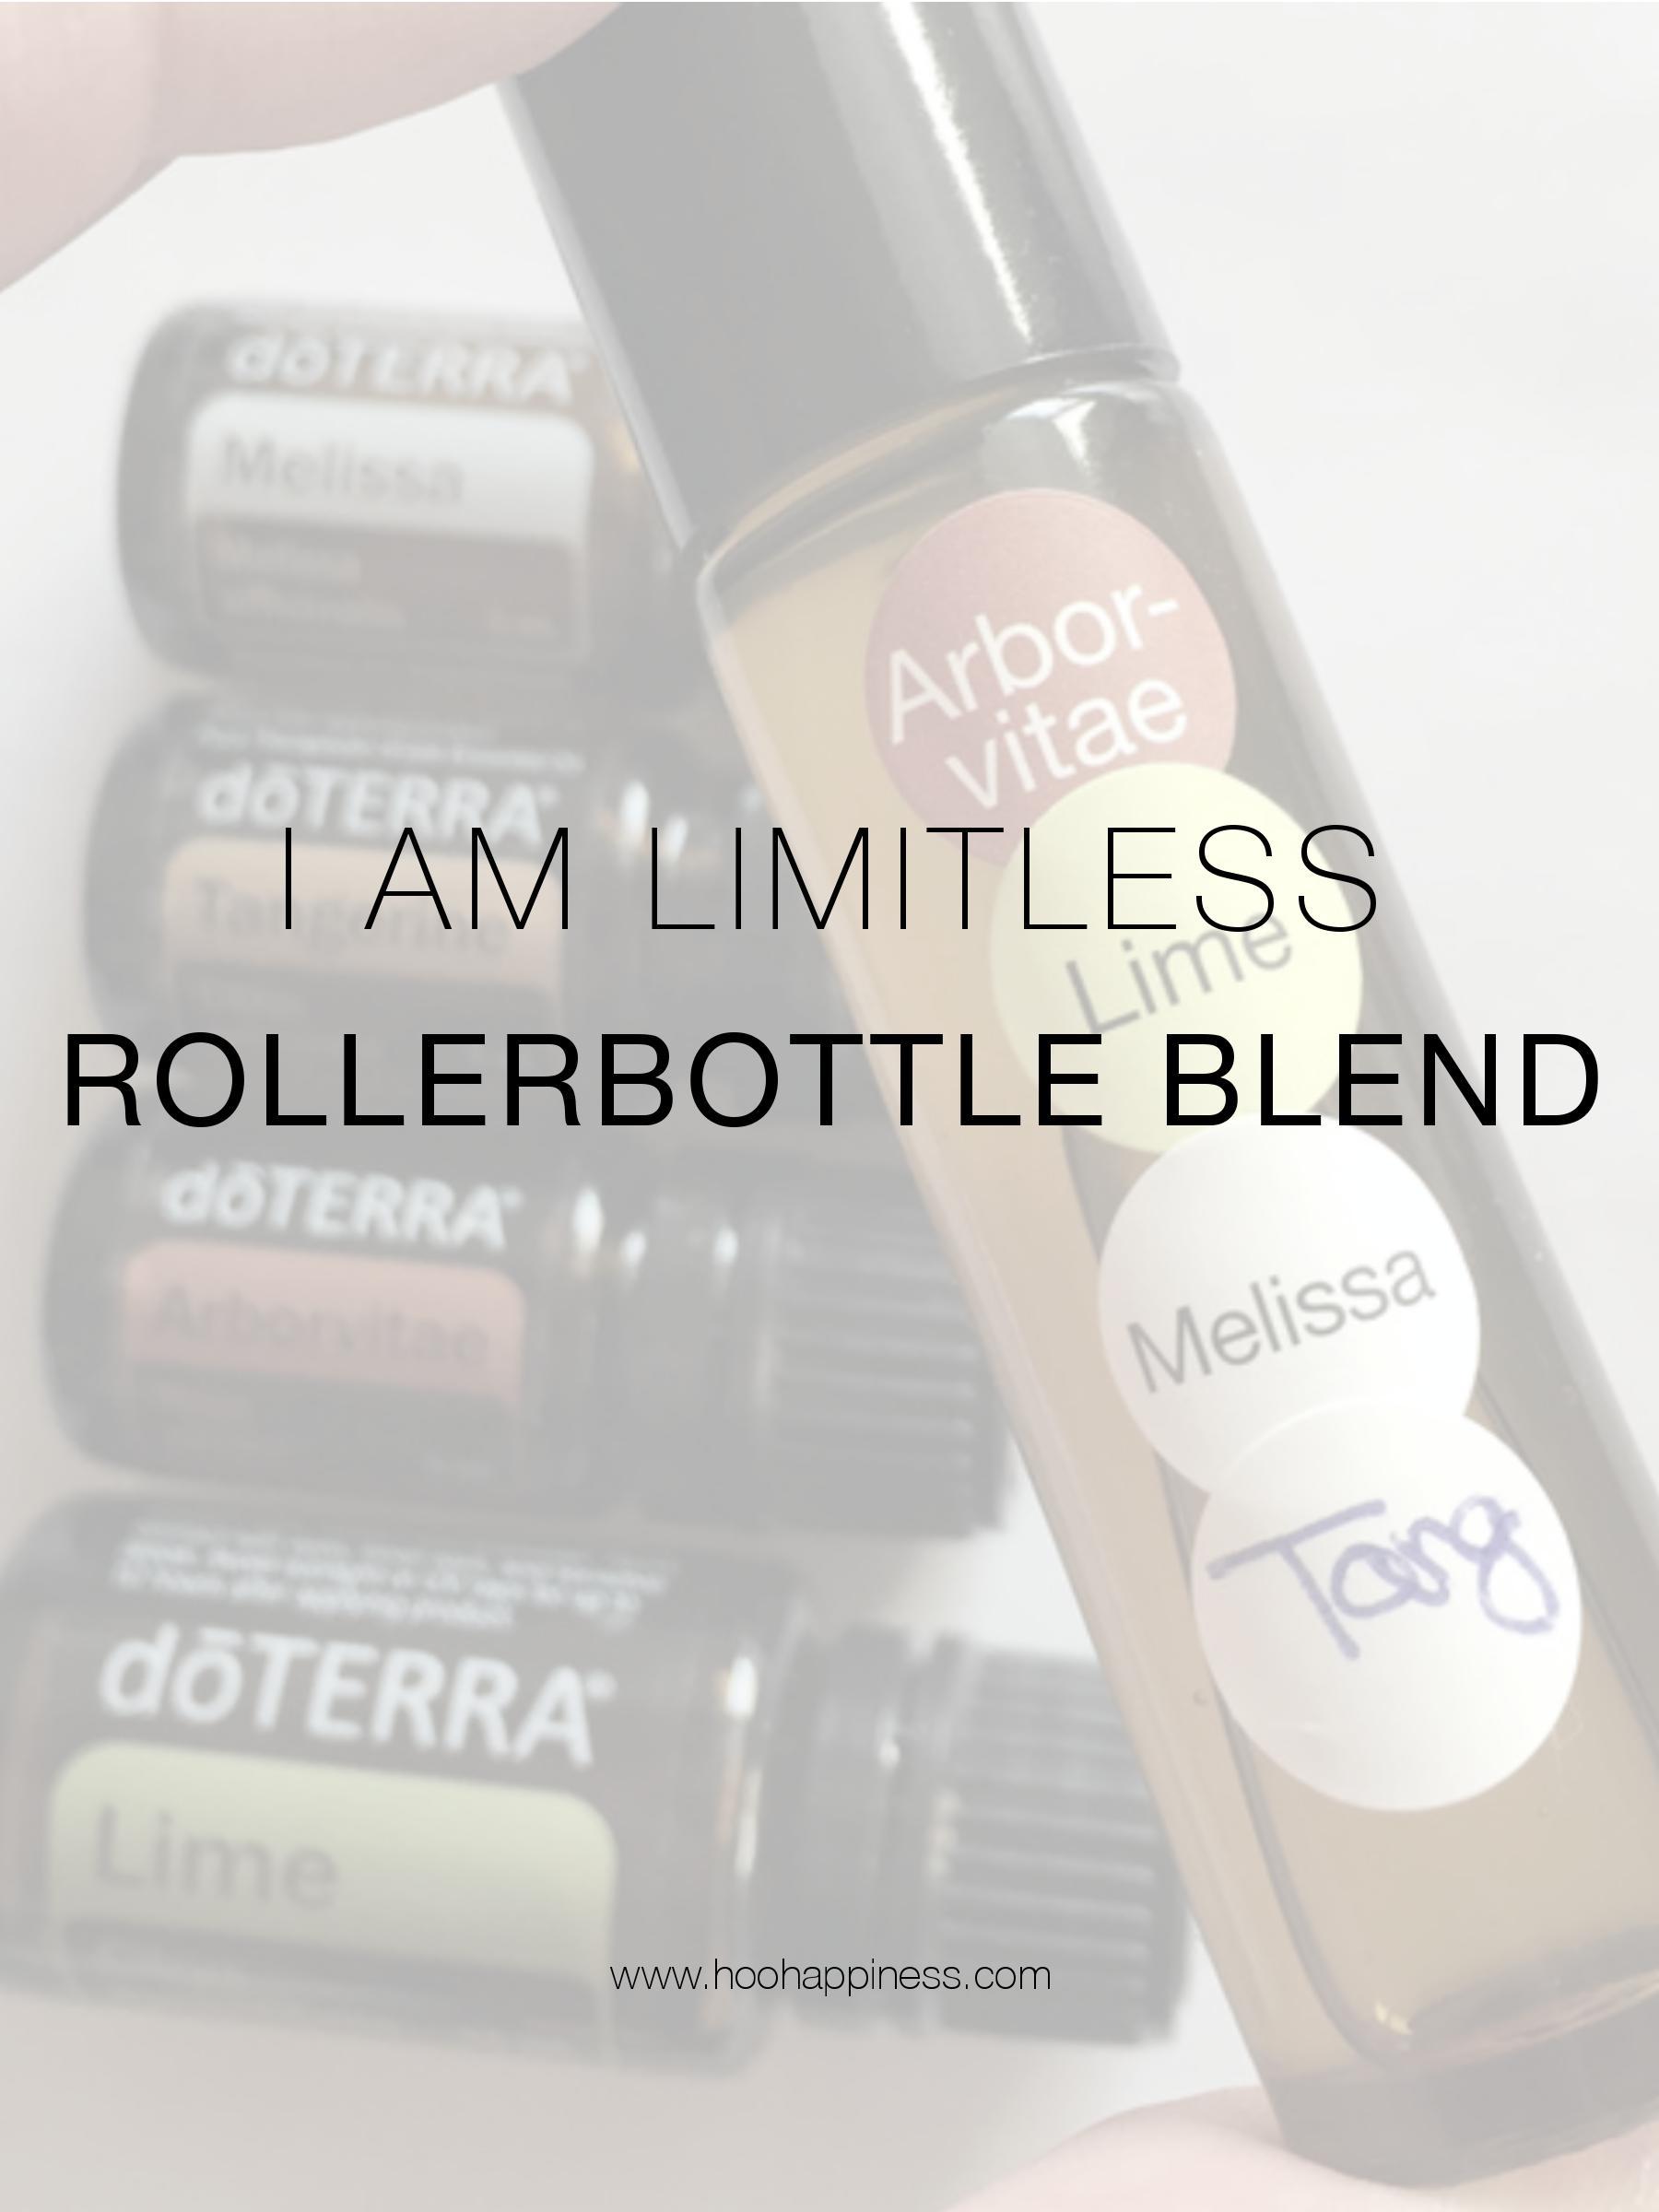 Limitless Rollerbottle Blend, Essential Oils, HOO Happiness Blog